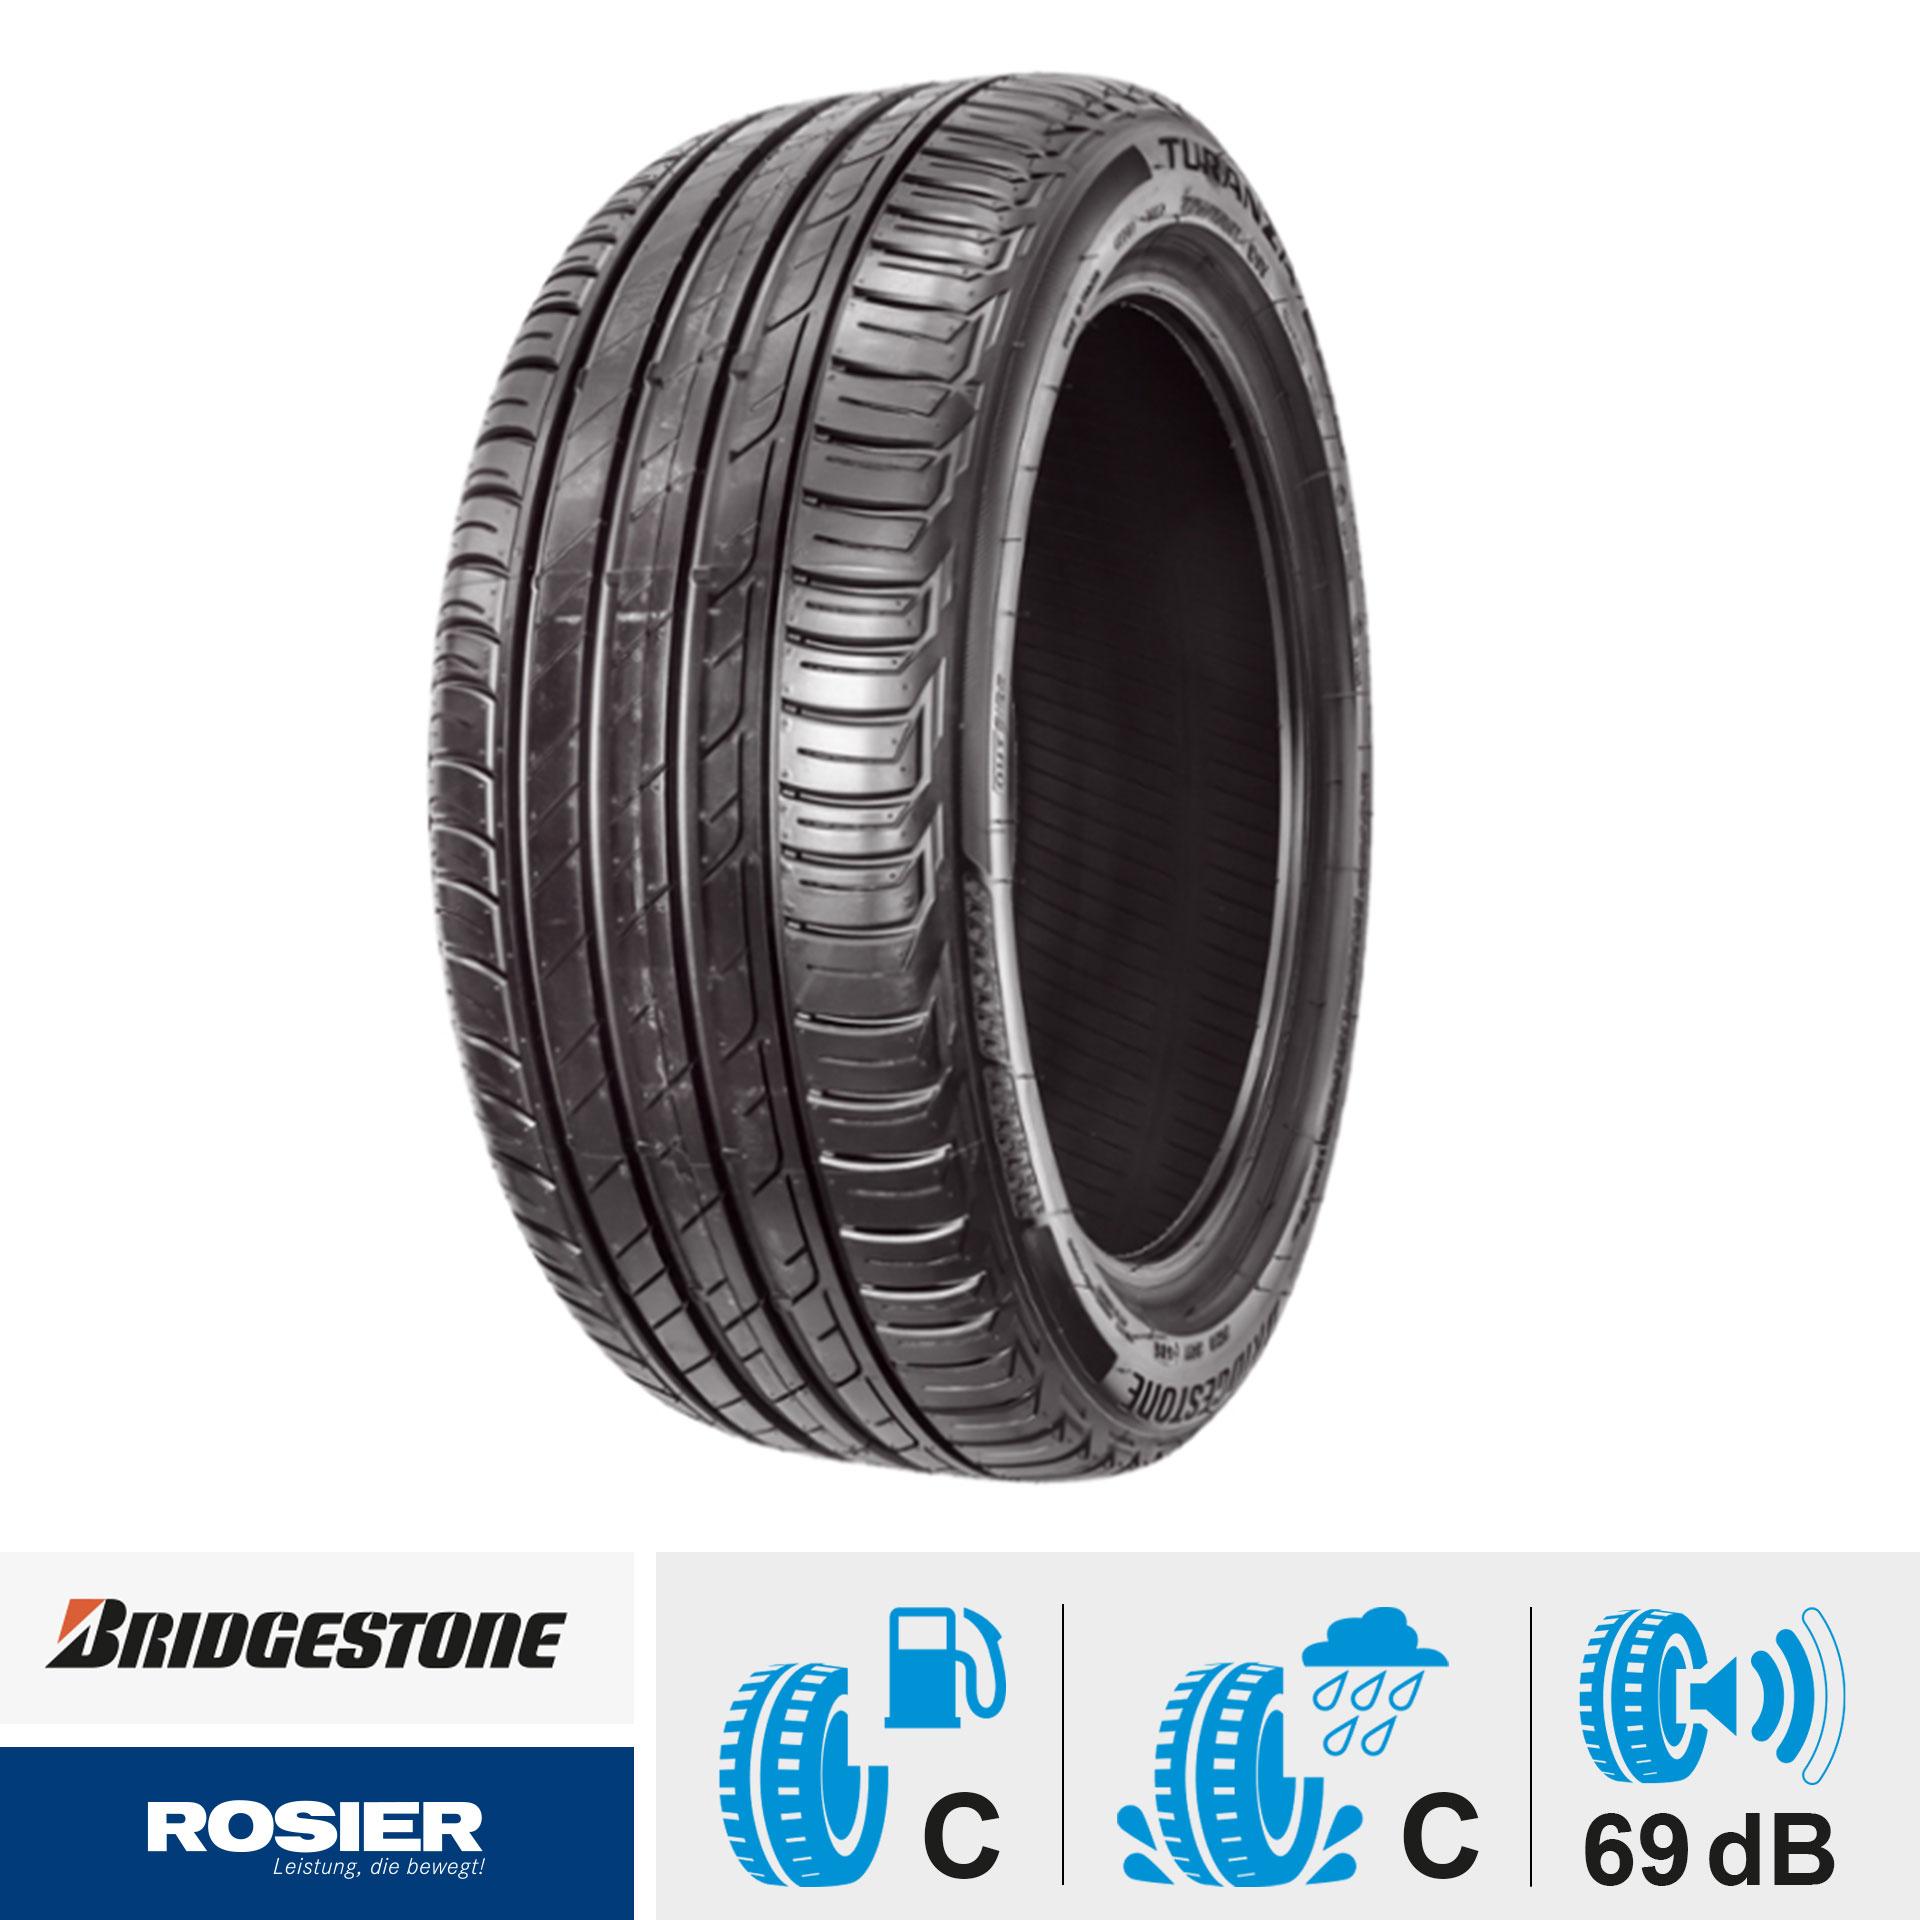 Bridgestone Turanza T001 185/50 R16 81 H